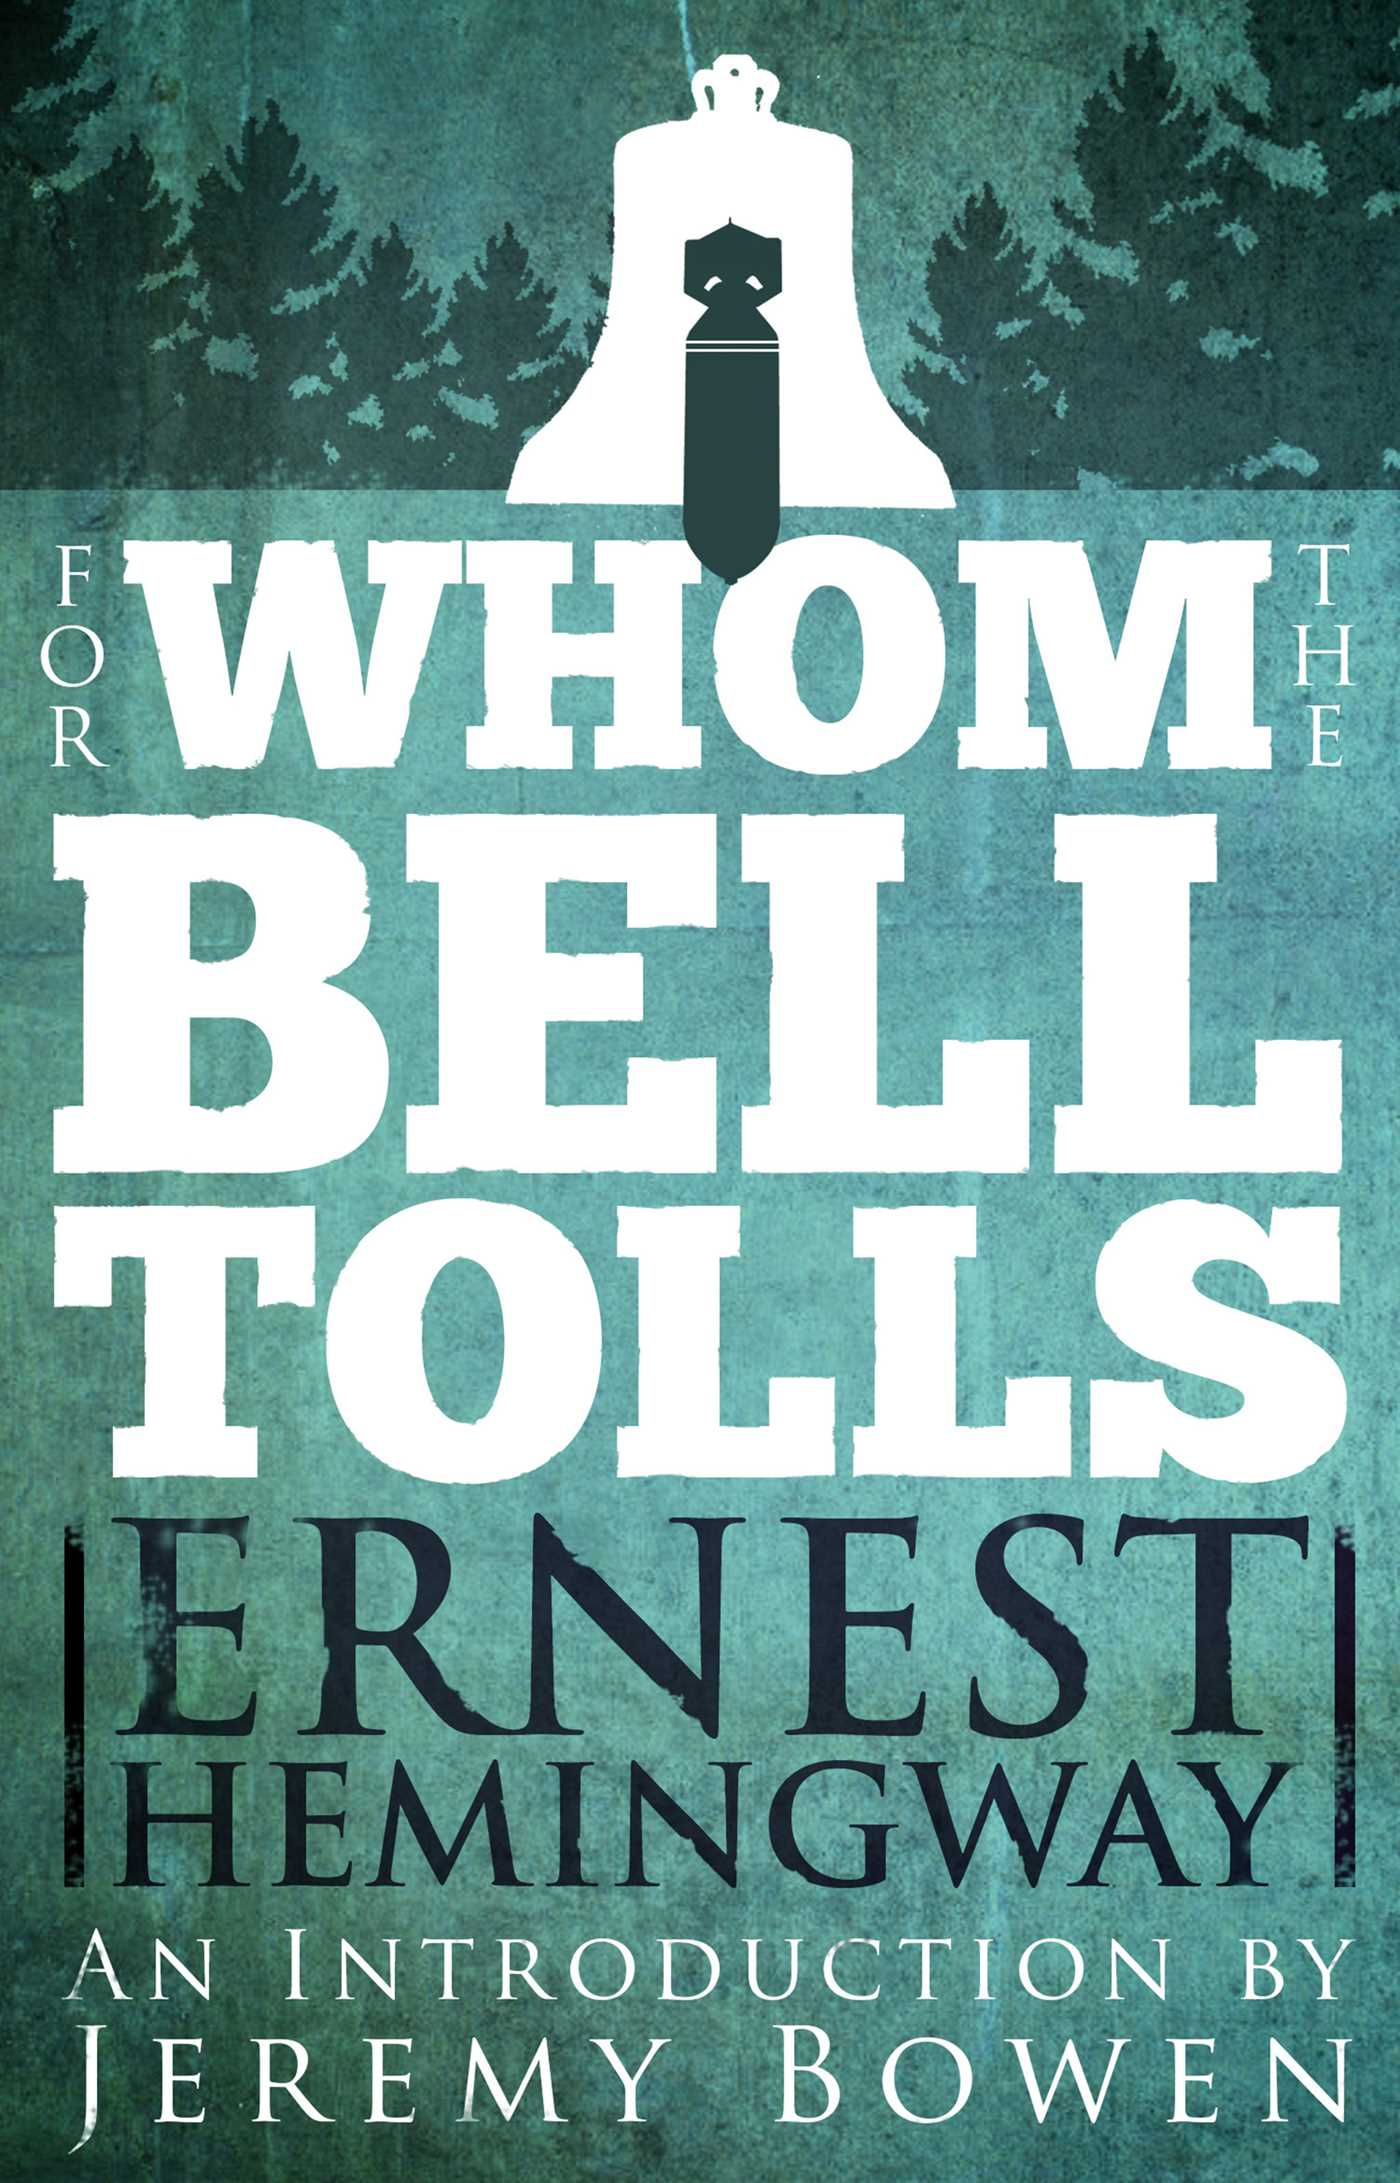 for whom the bell tolls lyrics